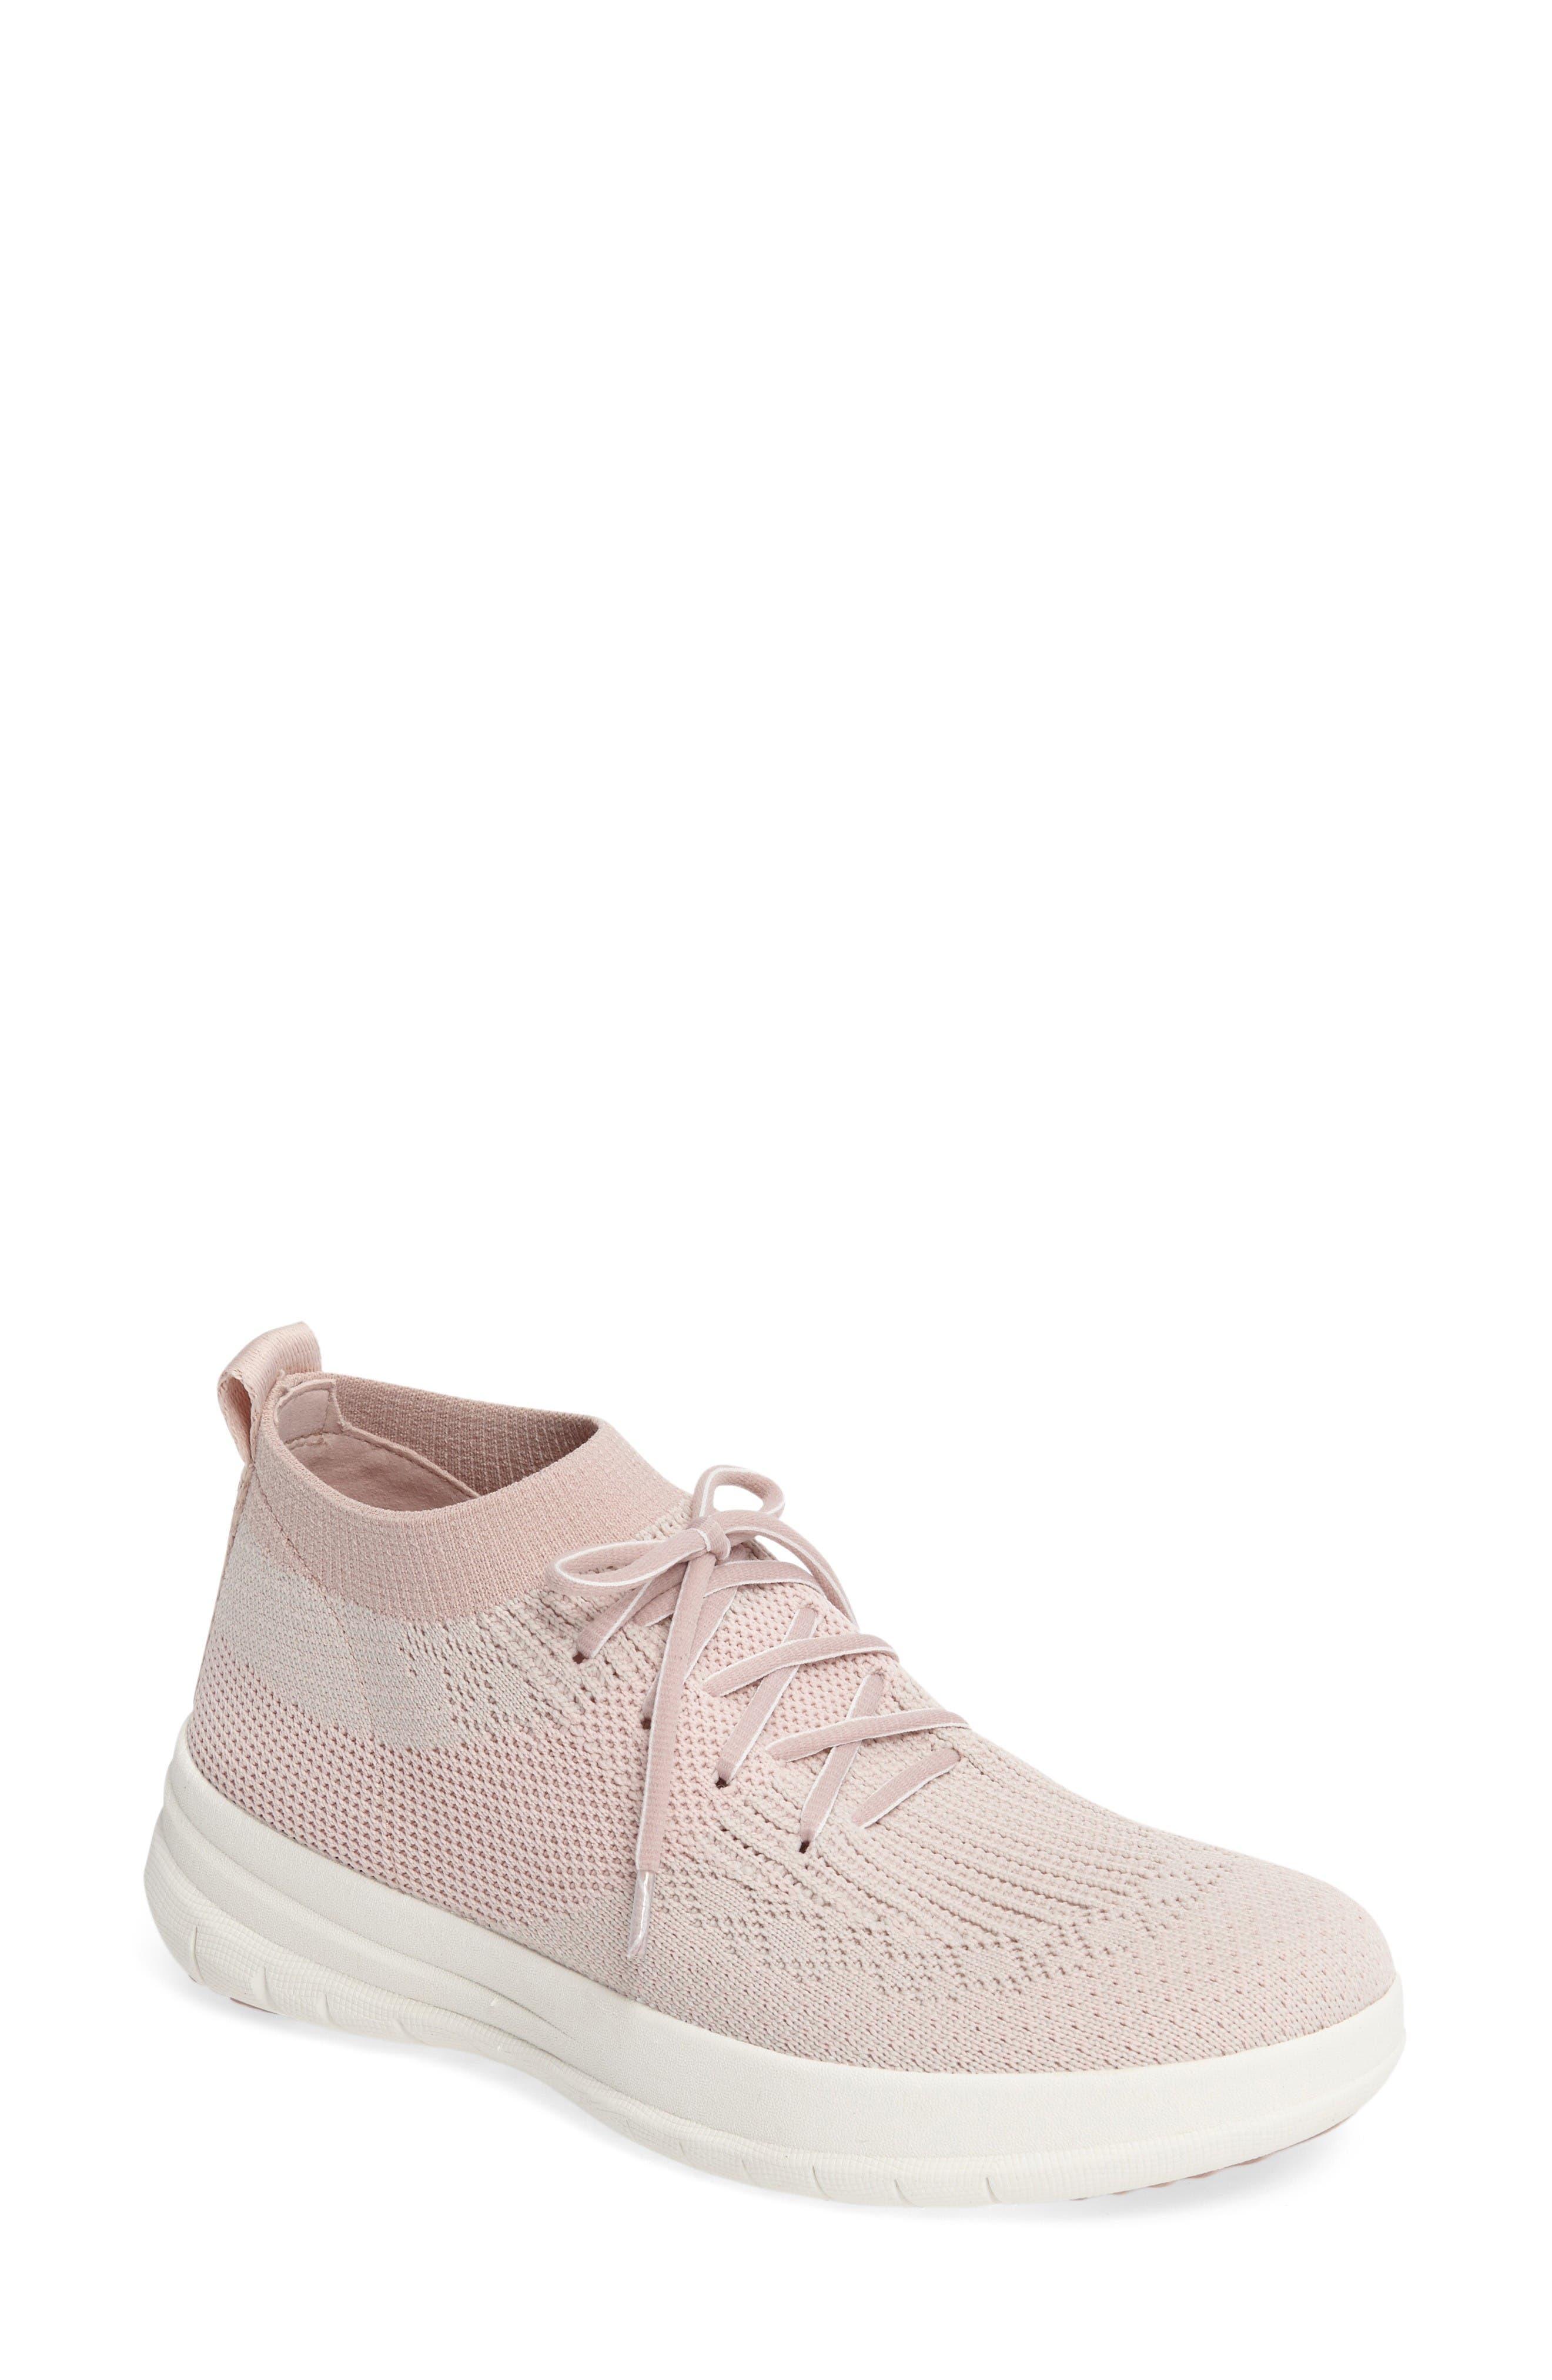 Überknit High Top Sneaker,                         Main,                         color, Neon Blush/ White Fabric